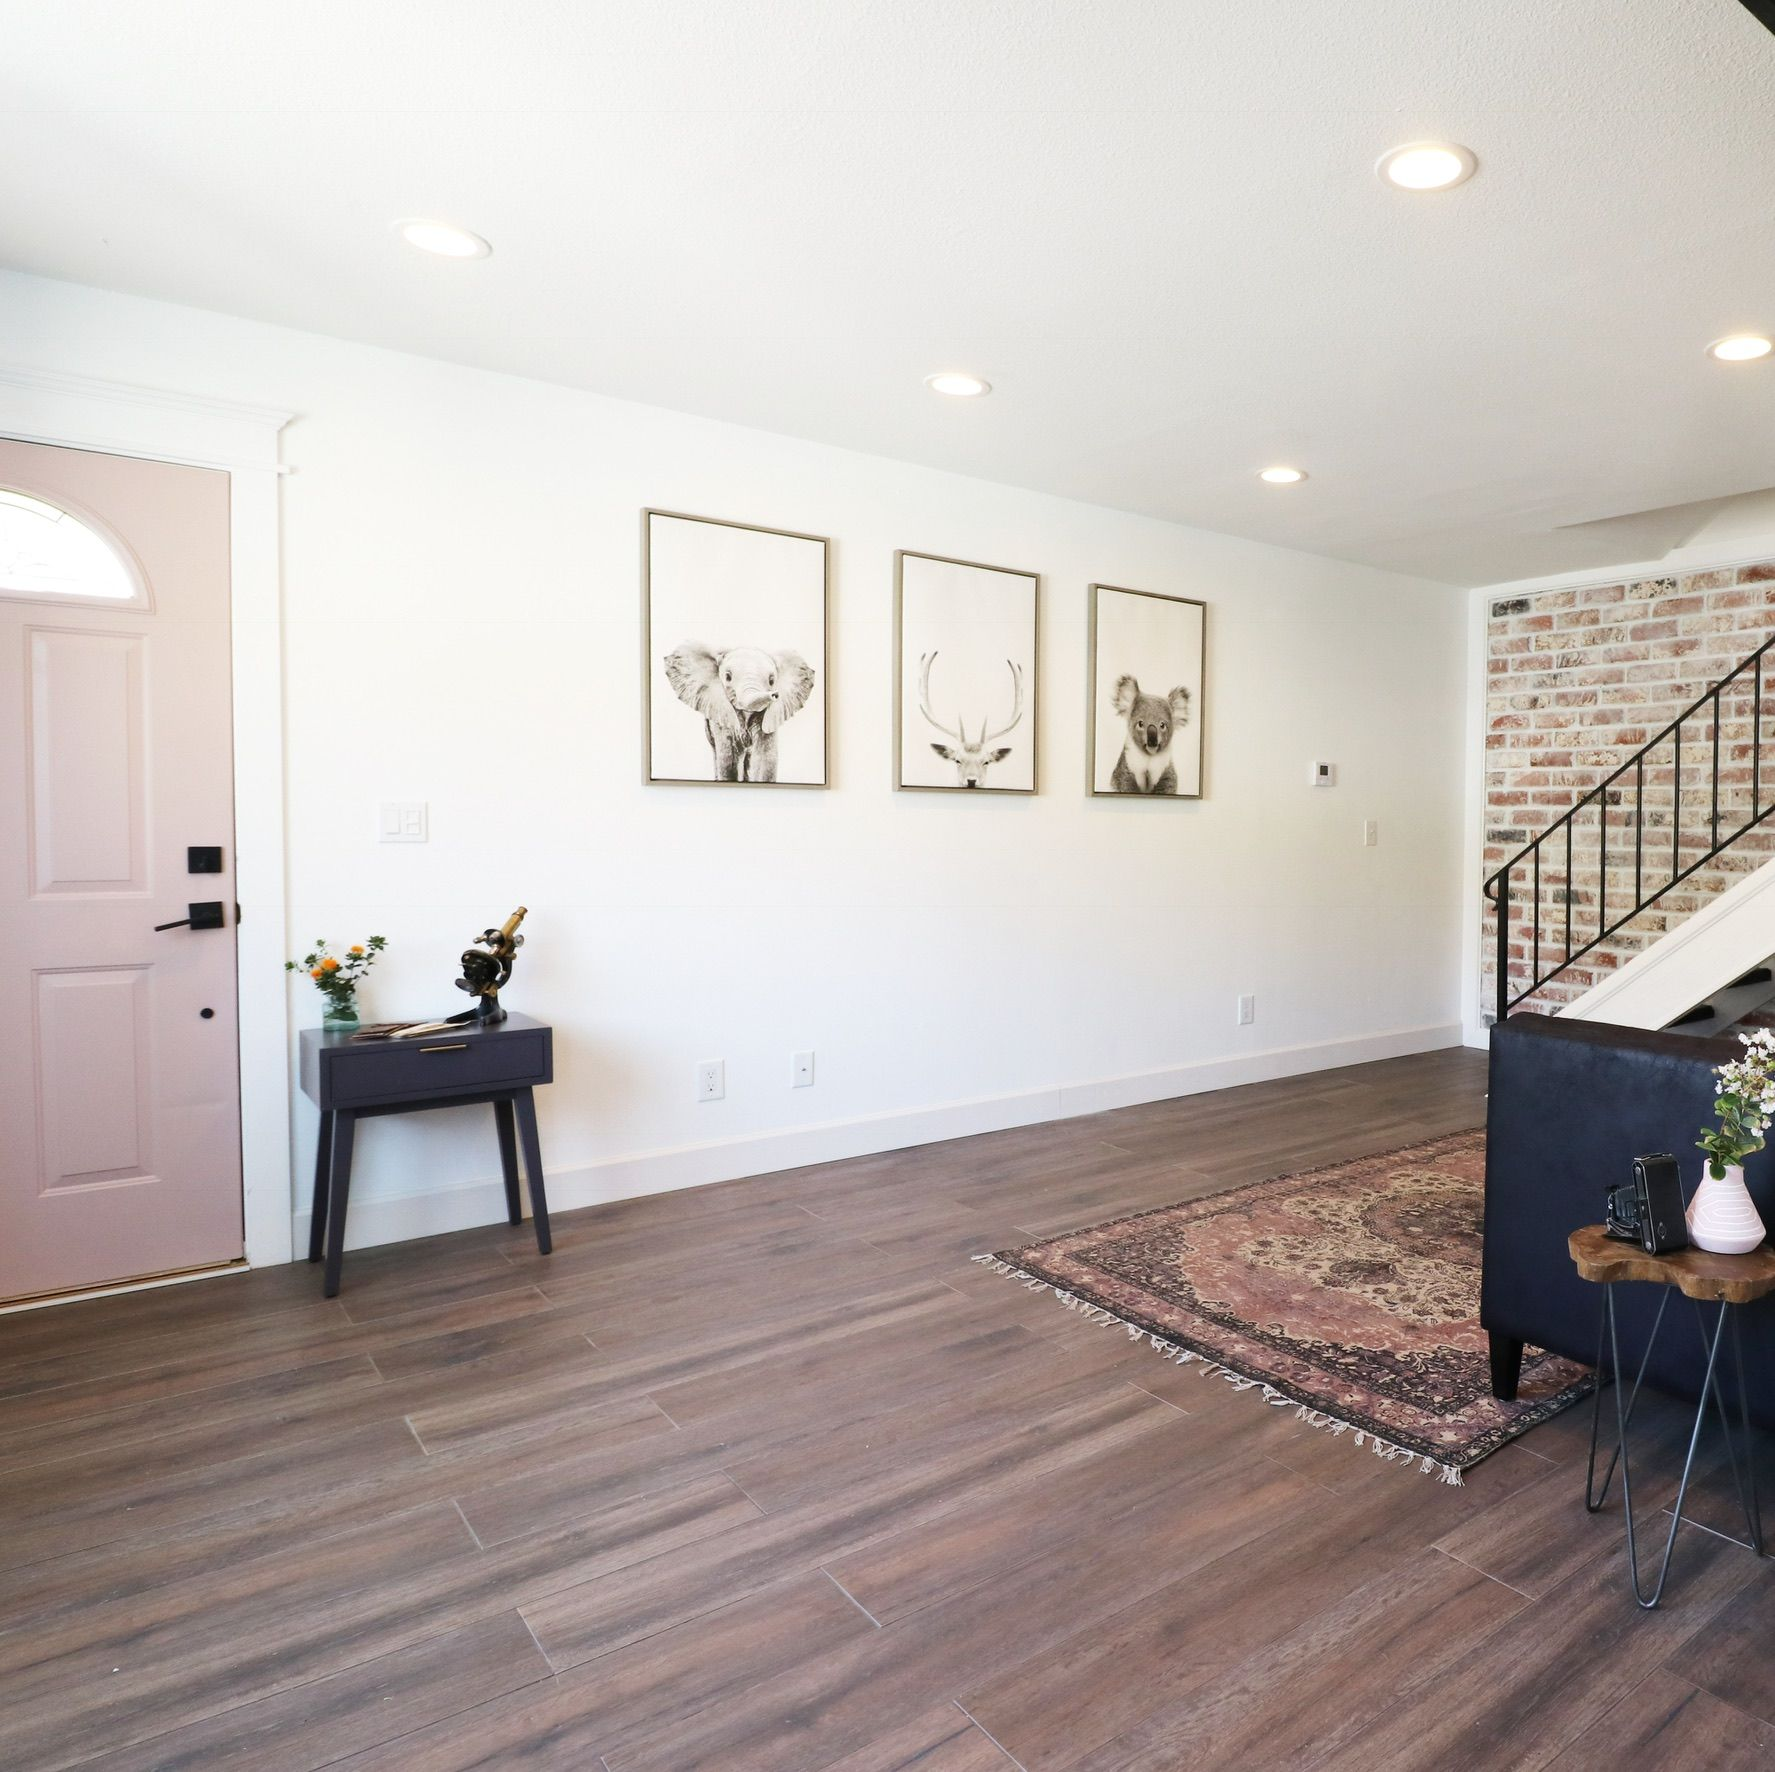 Santa Clarita For Rent - The Brick House Modern home ...